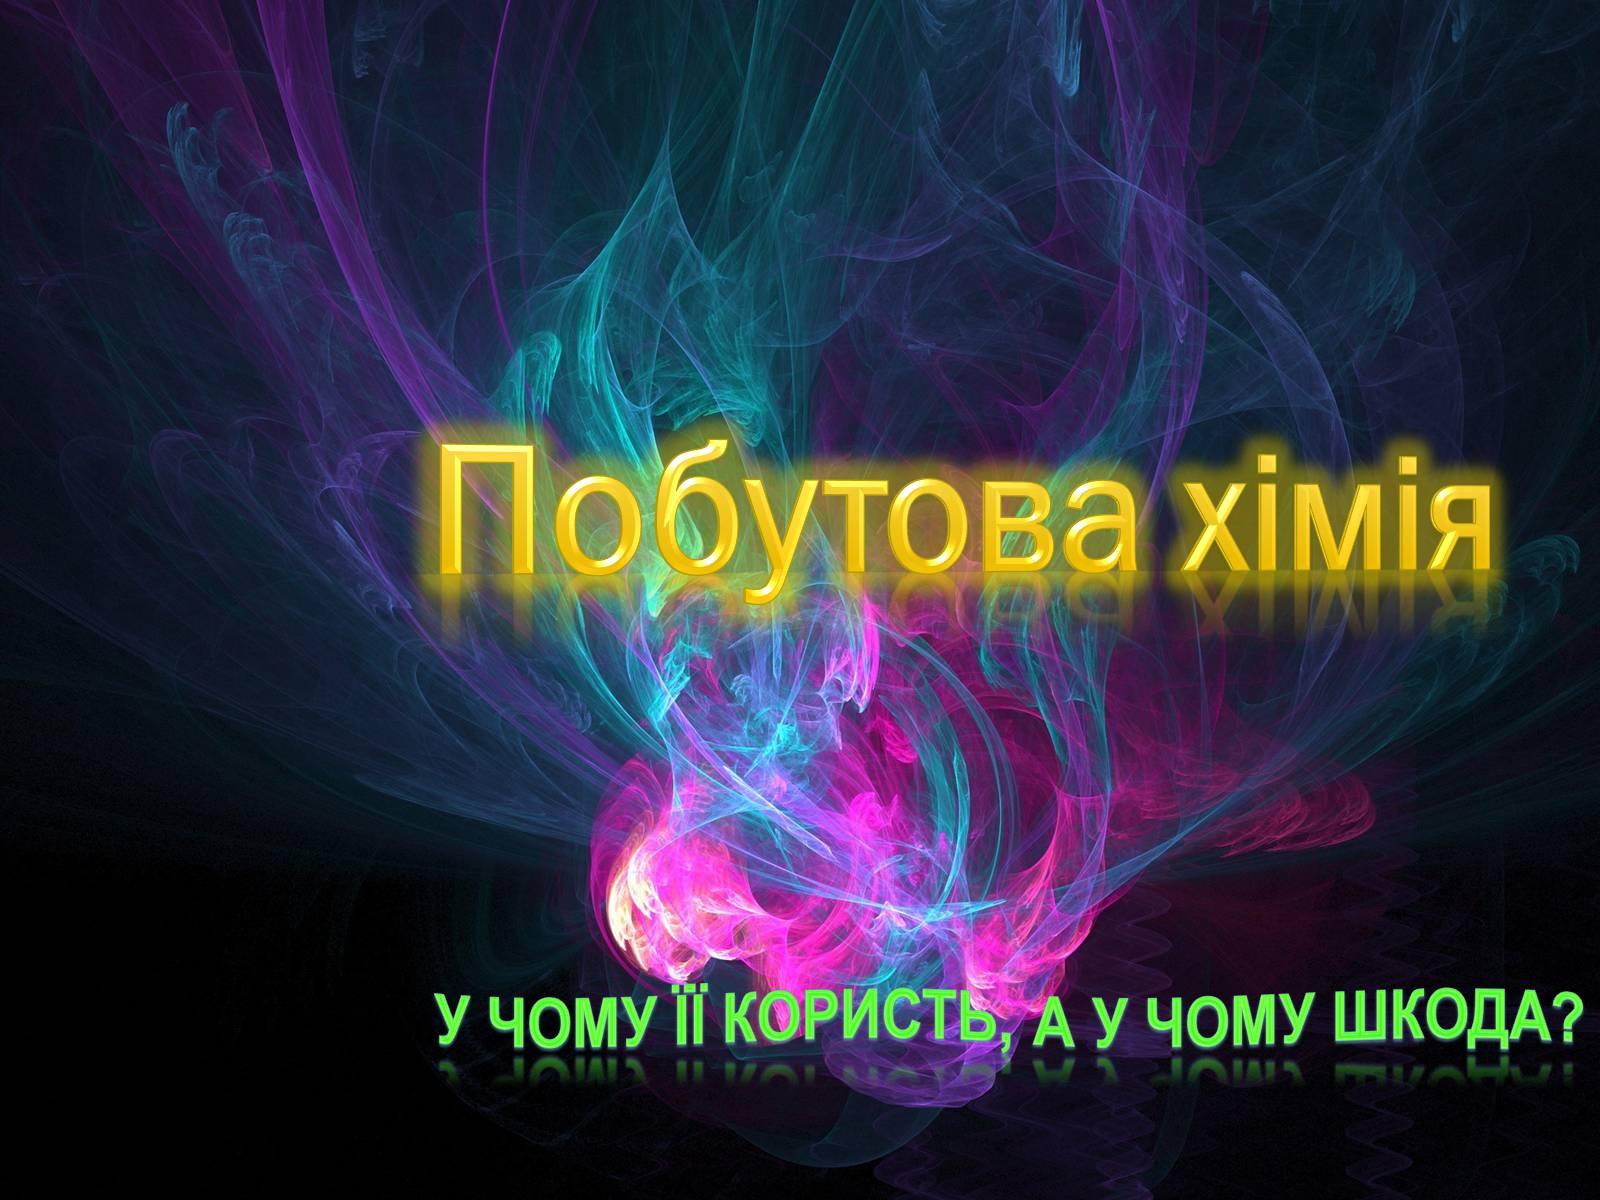 Презентація на тему Побутова хімія (варіант 2) — презентації з хімії ... 646fbe66beadd